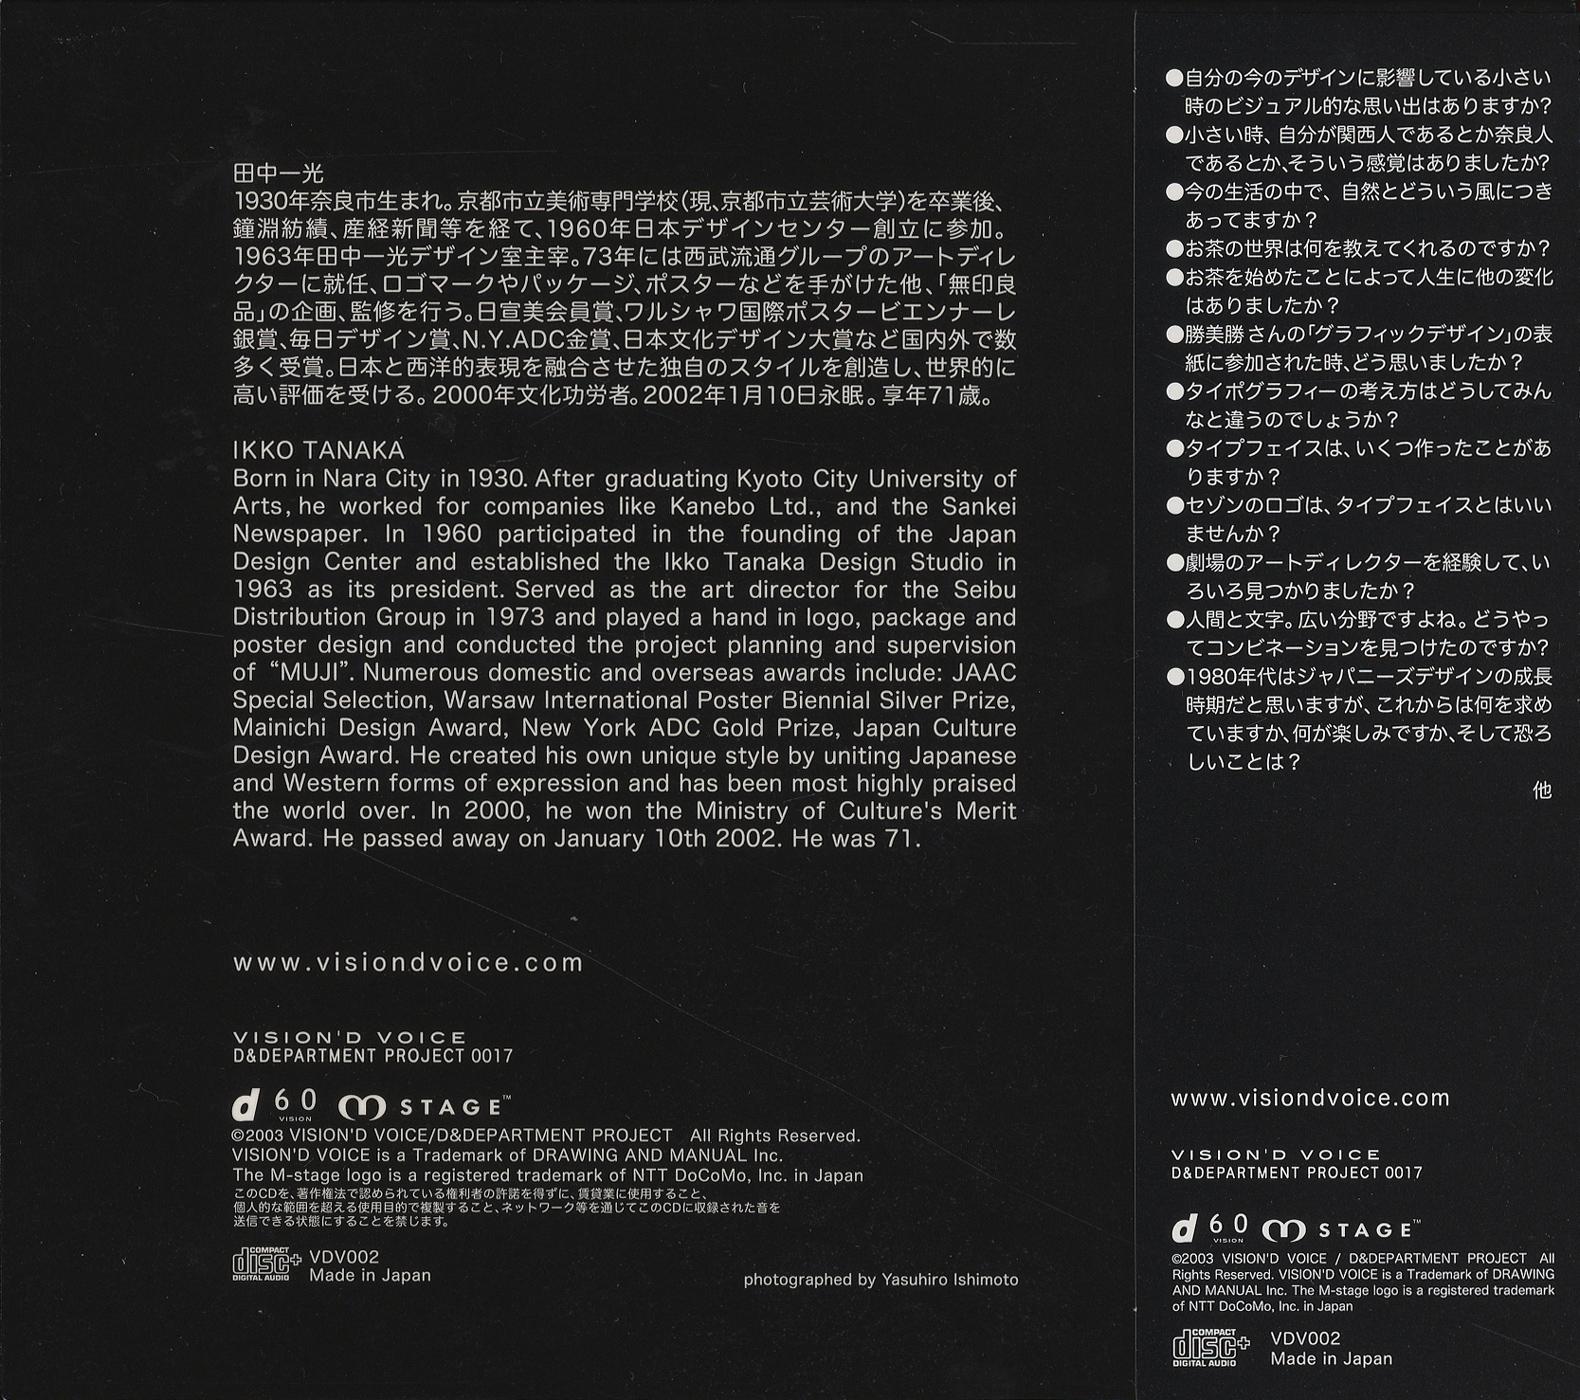 VISION'D VOICE 002 IKKO TANAKA 1998[image2]